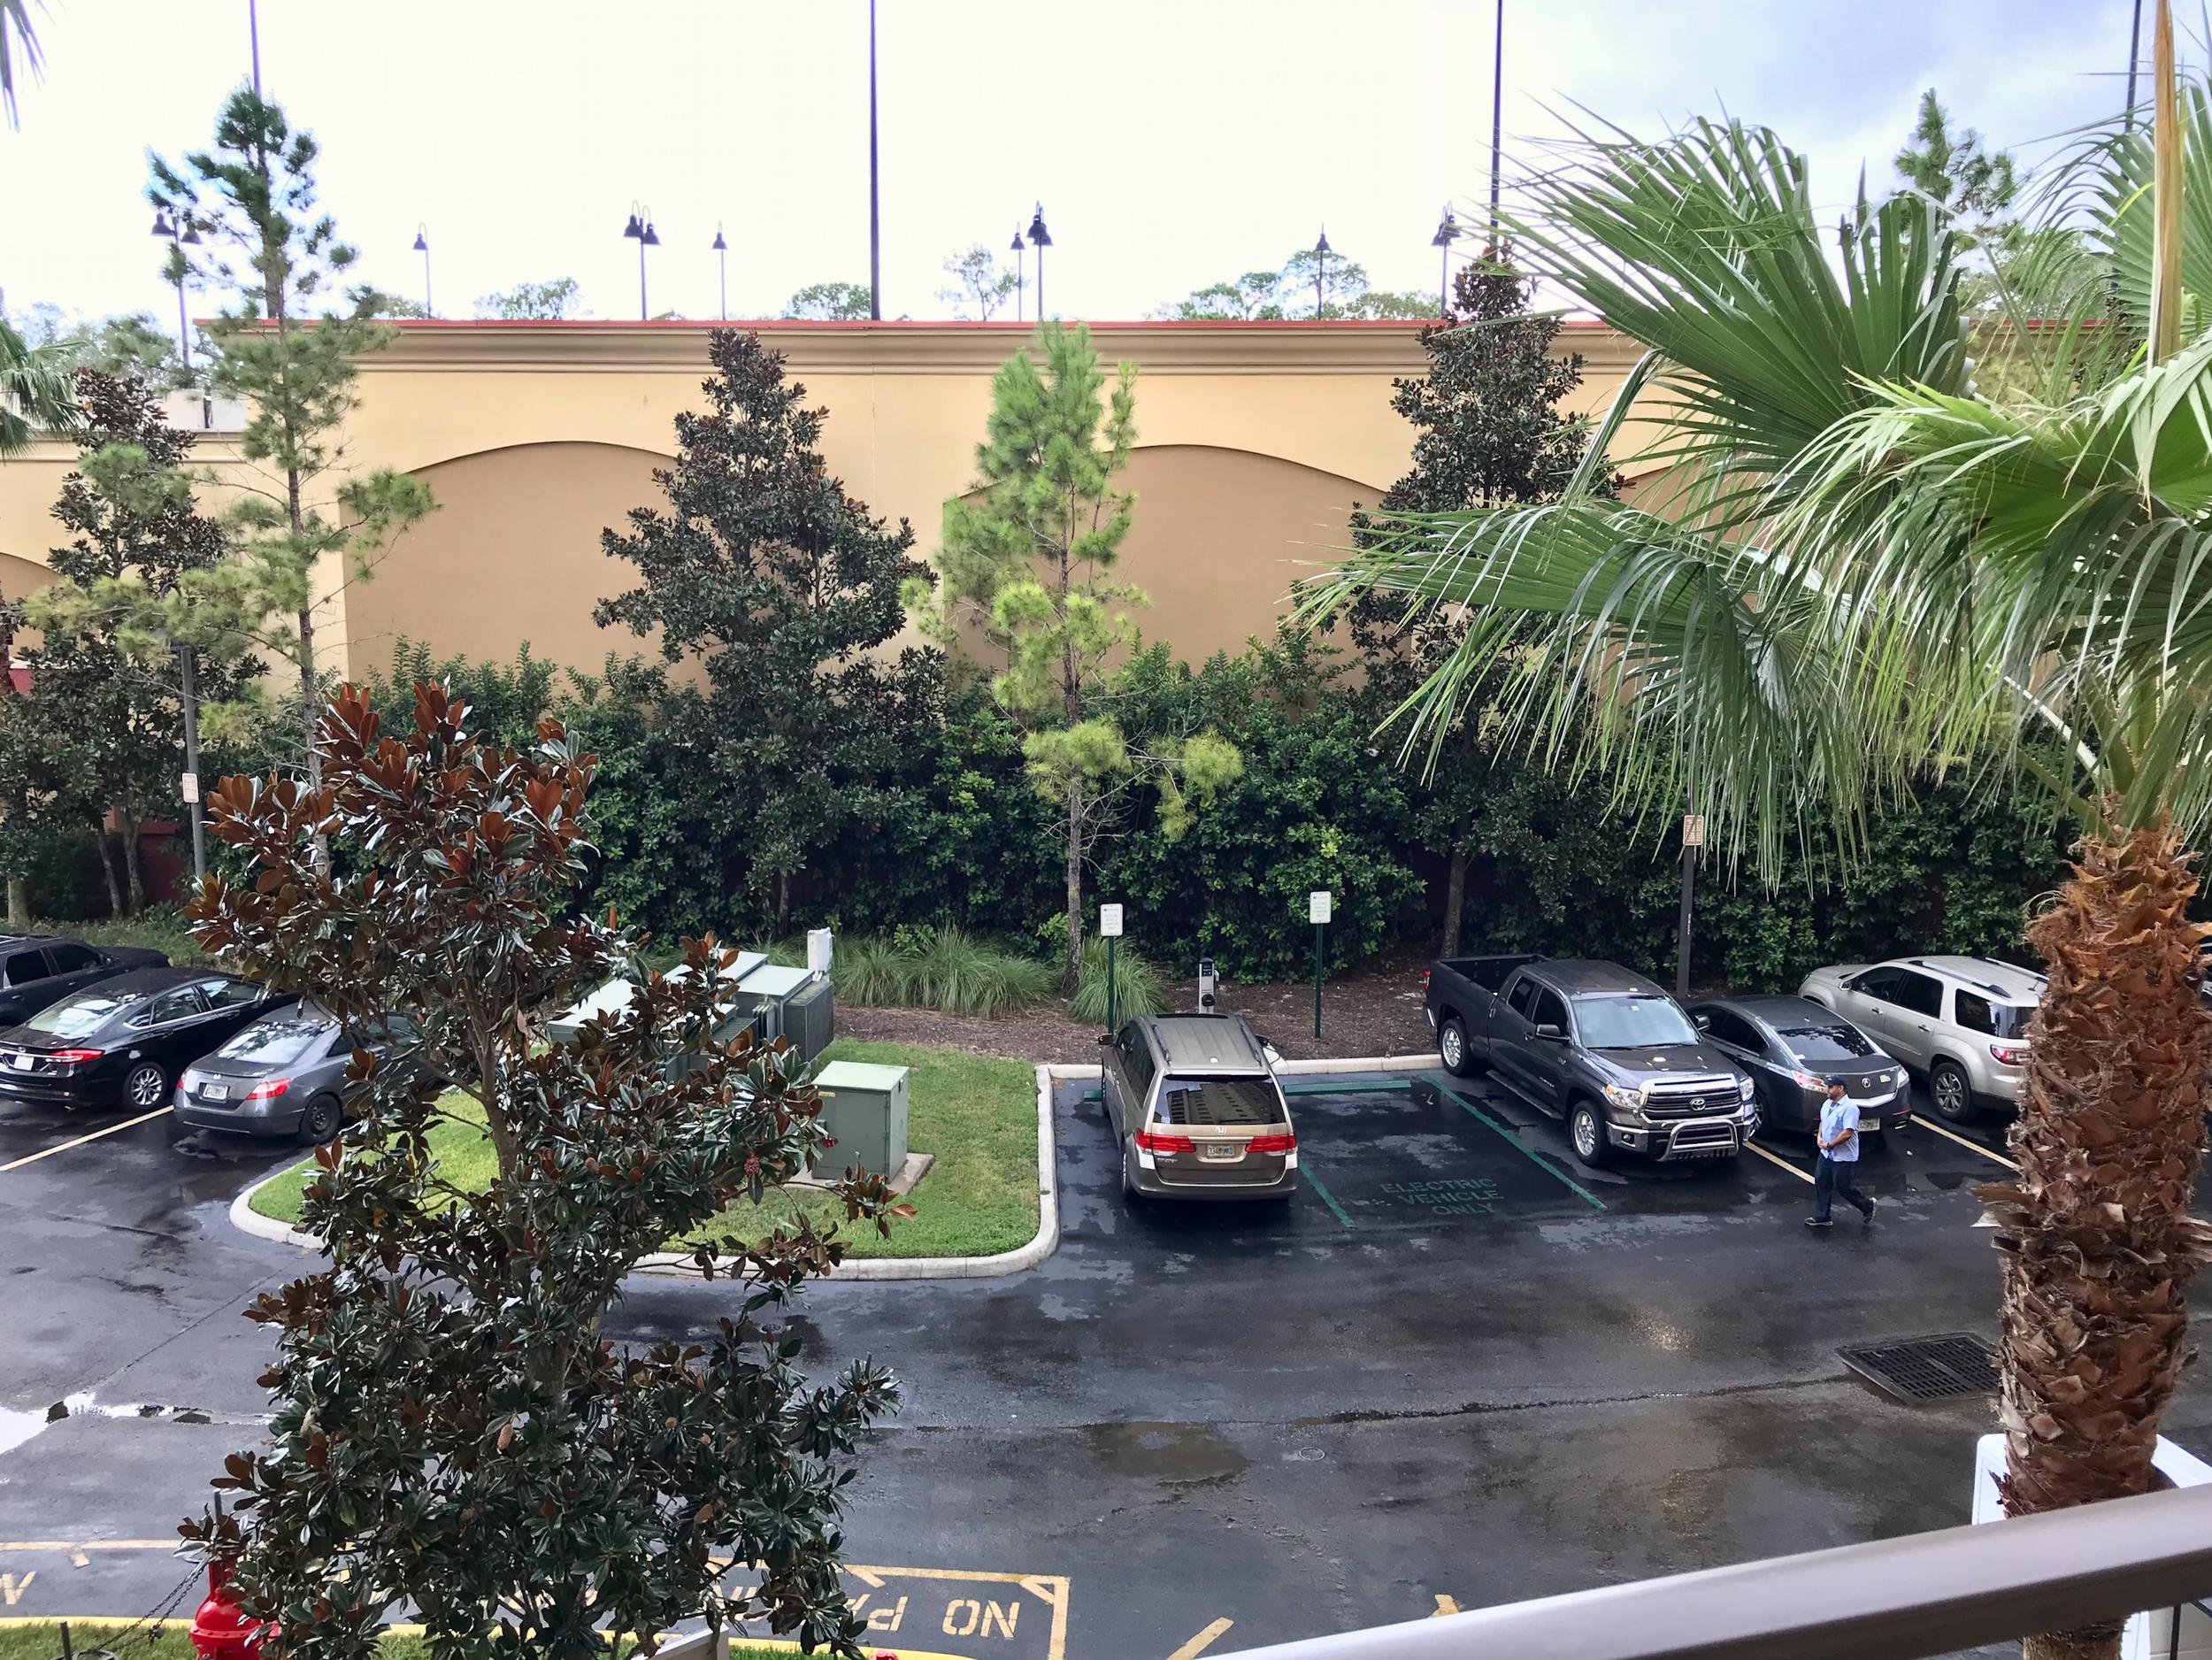 Condo balcony view